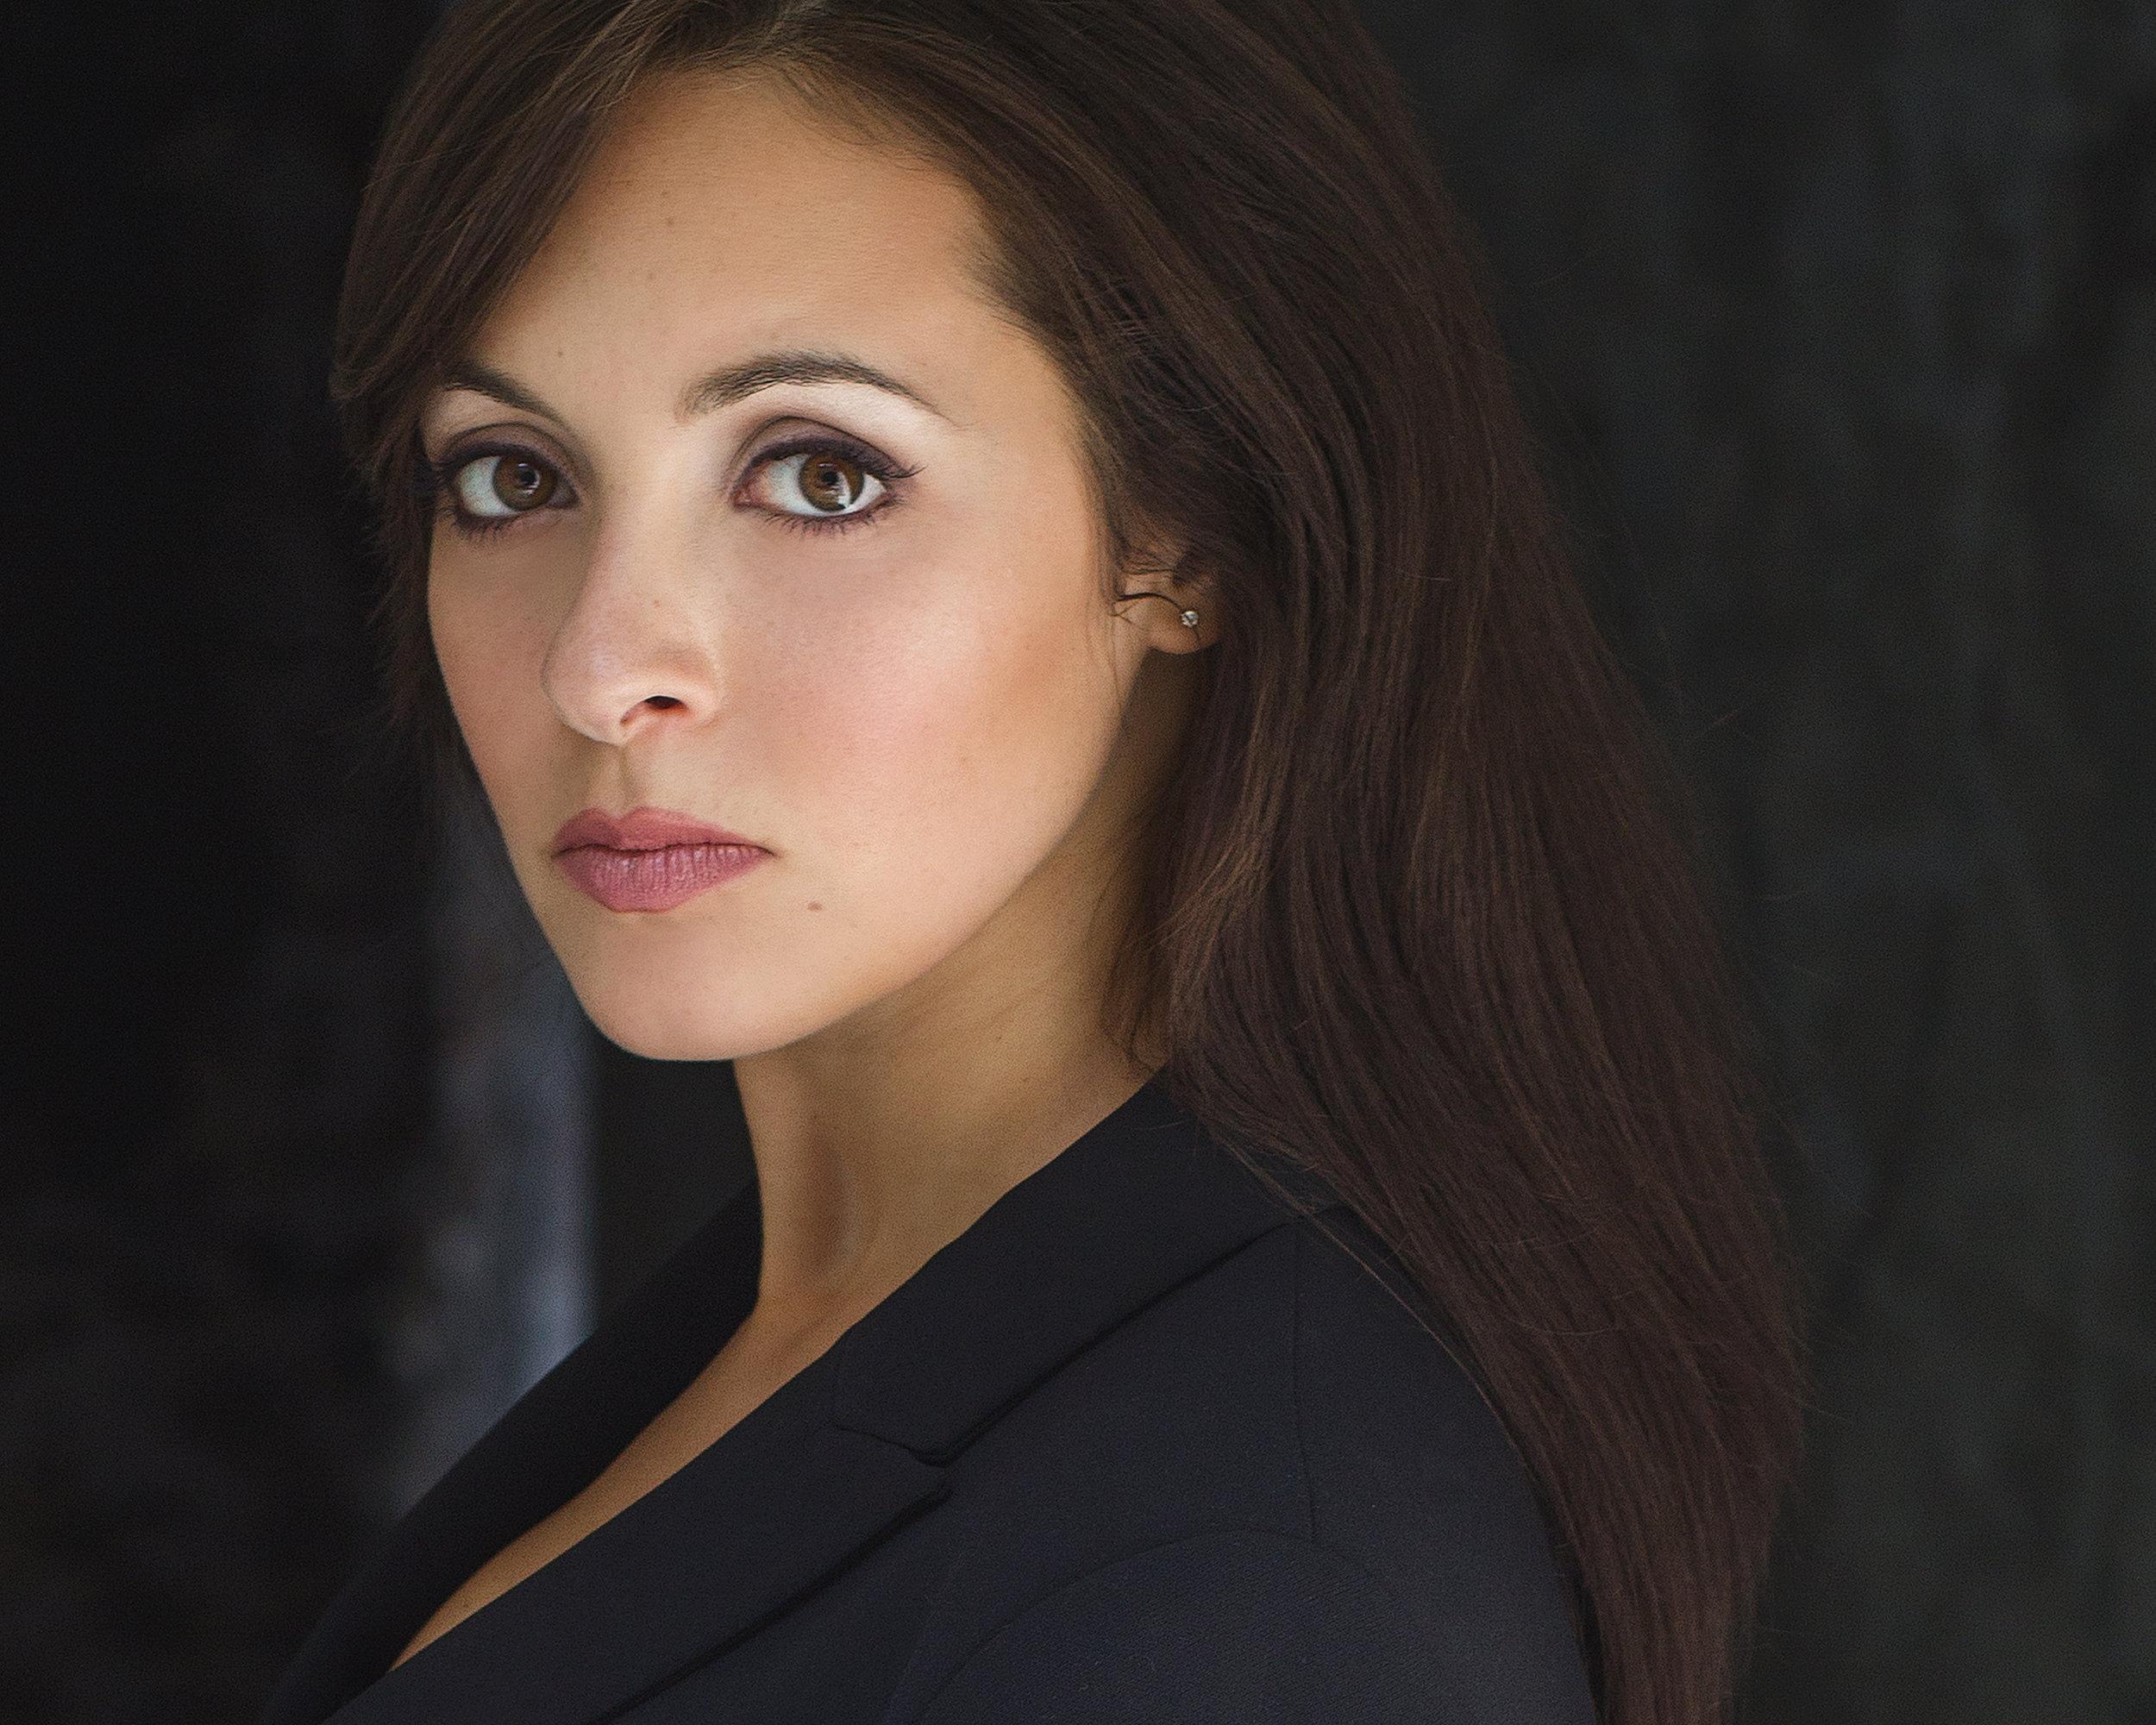 Christina DeCicco headshot 3.jpg